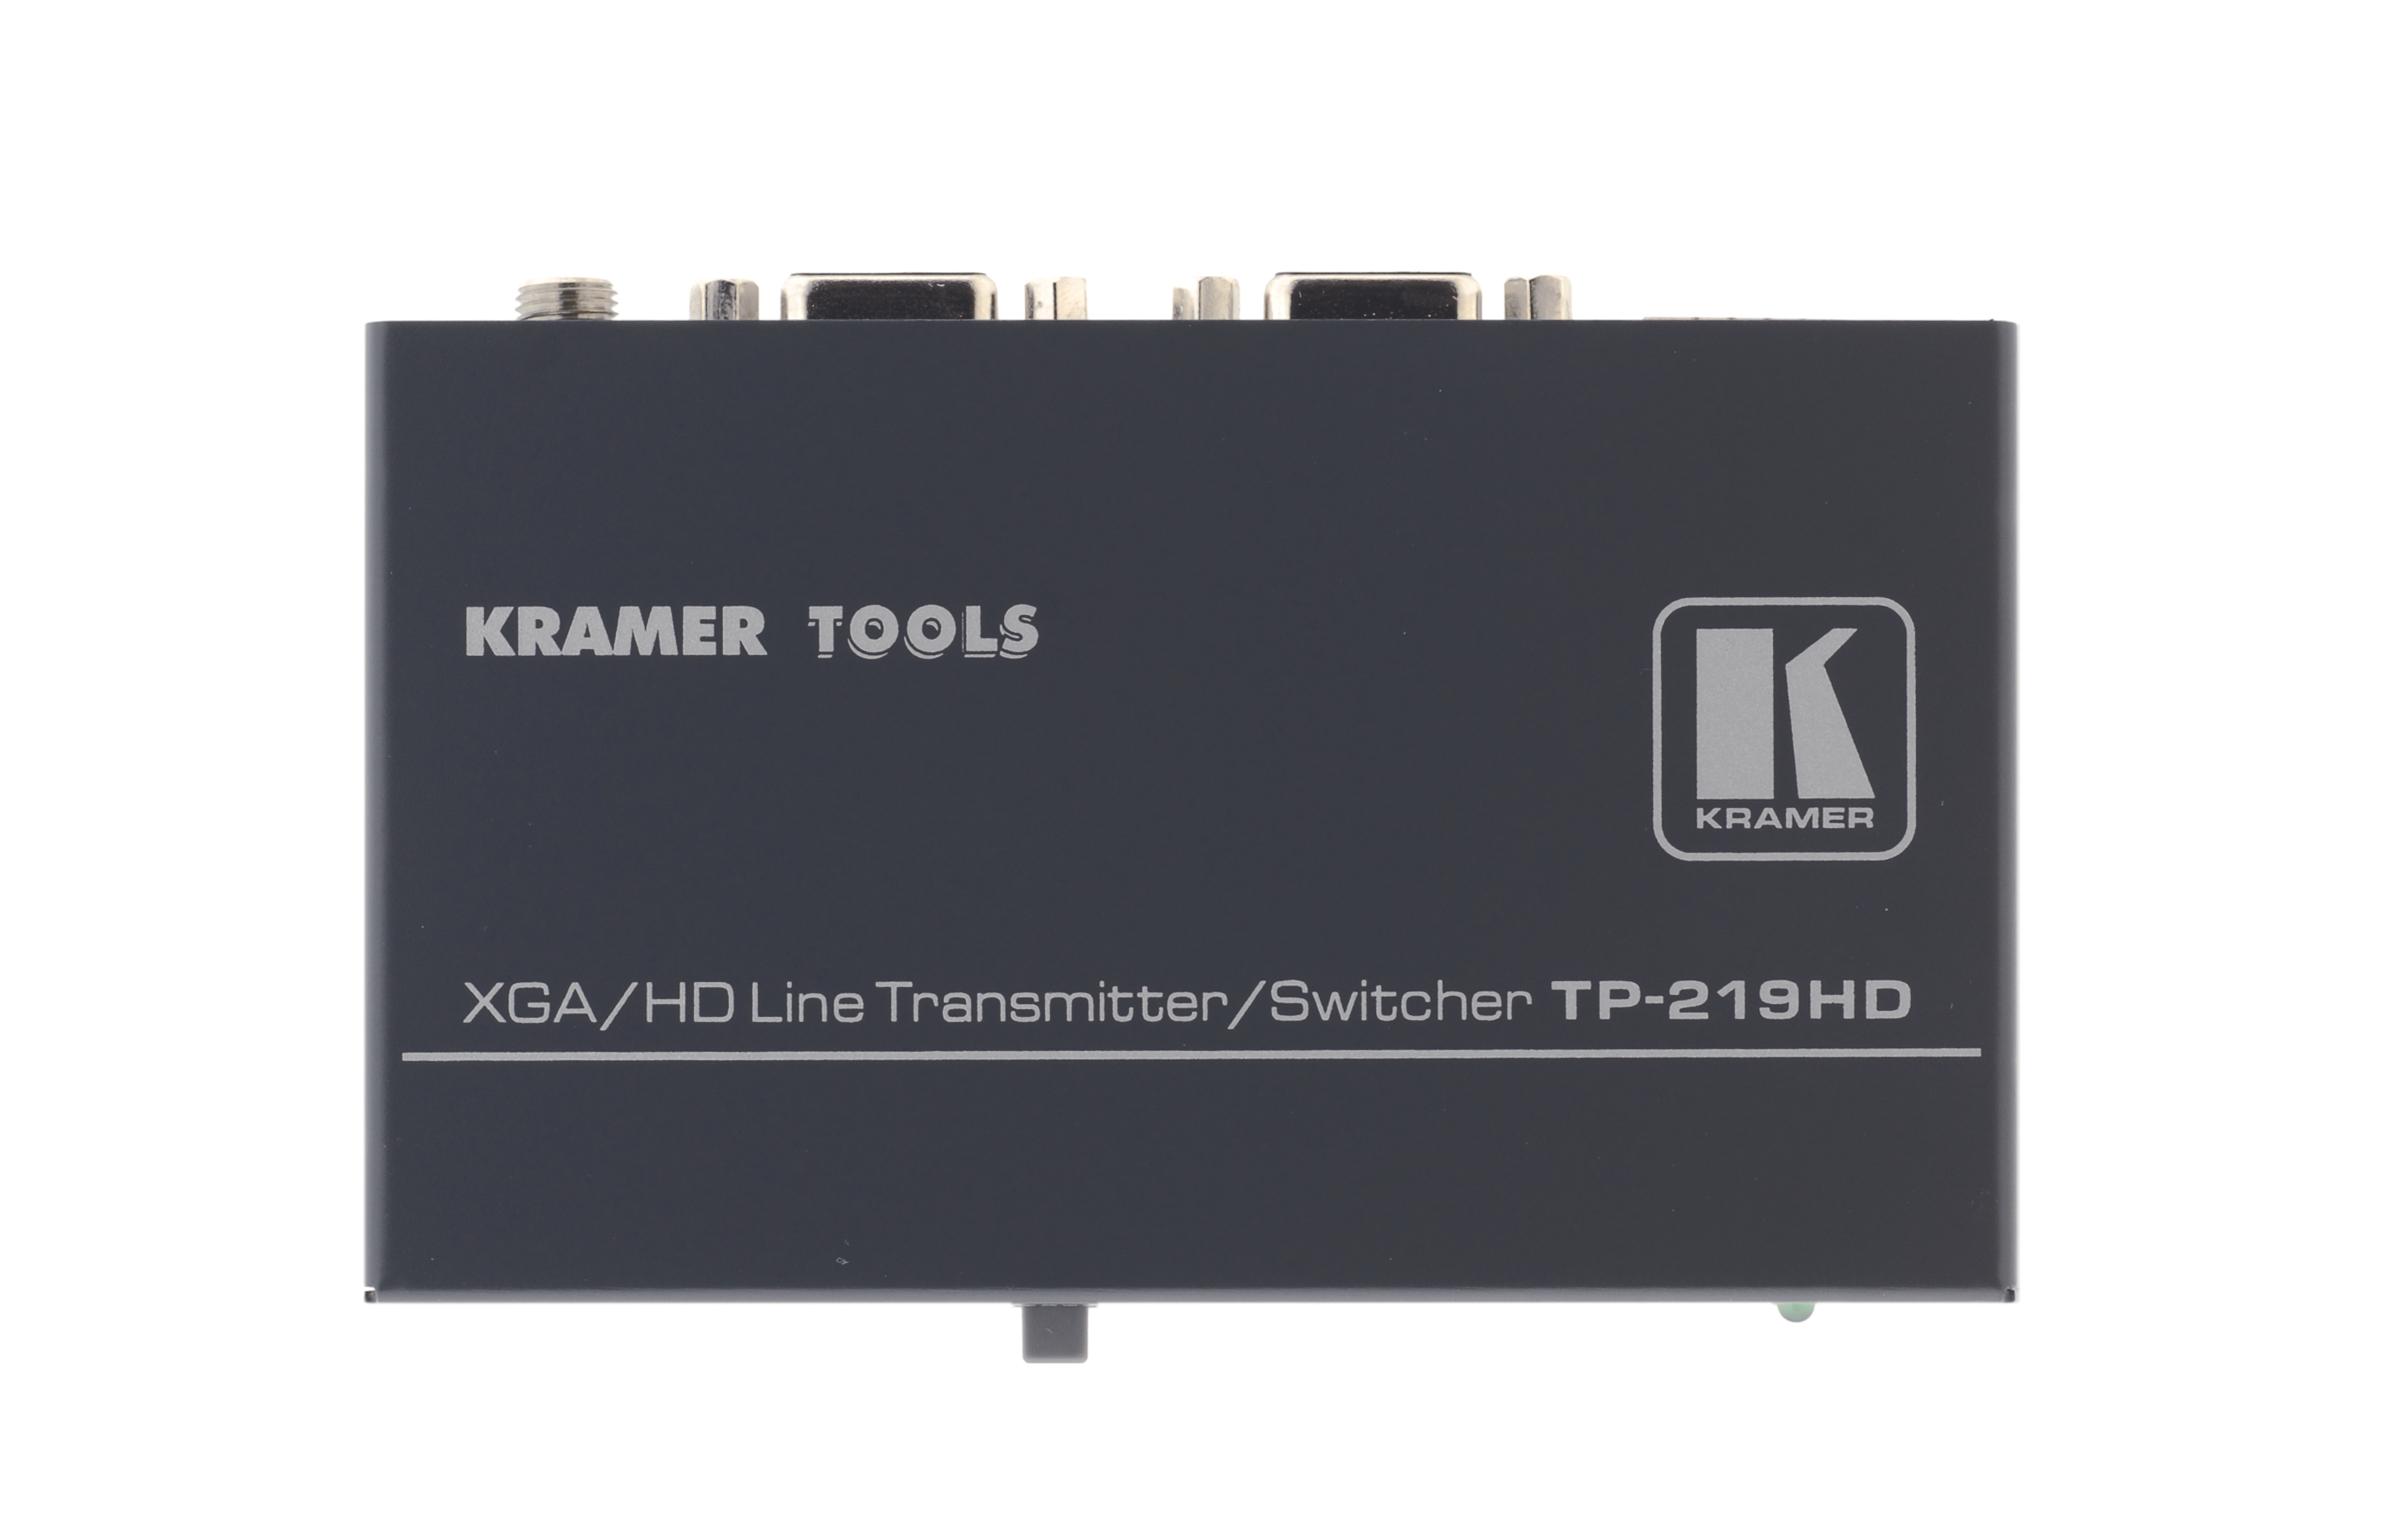 Kramer Introduces New Twisted Pair Transmitter/Receiver Set